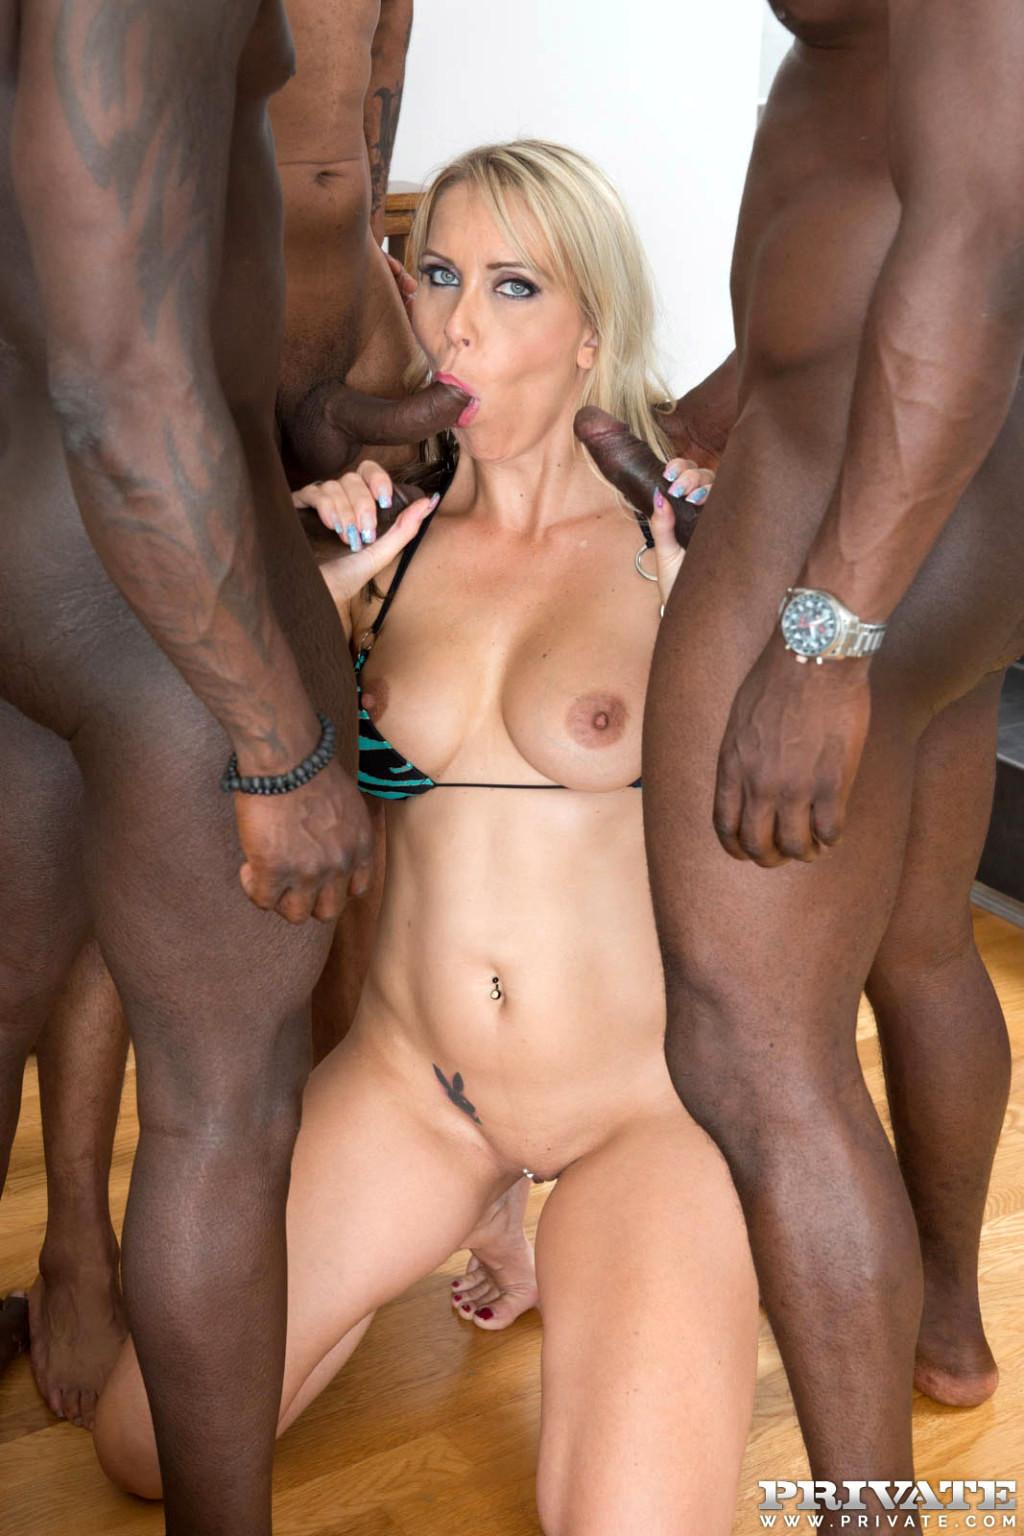 Interracial milf anal gangbang porn